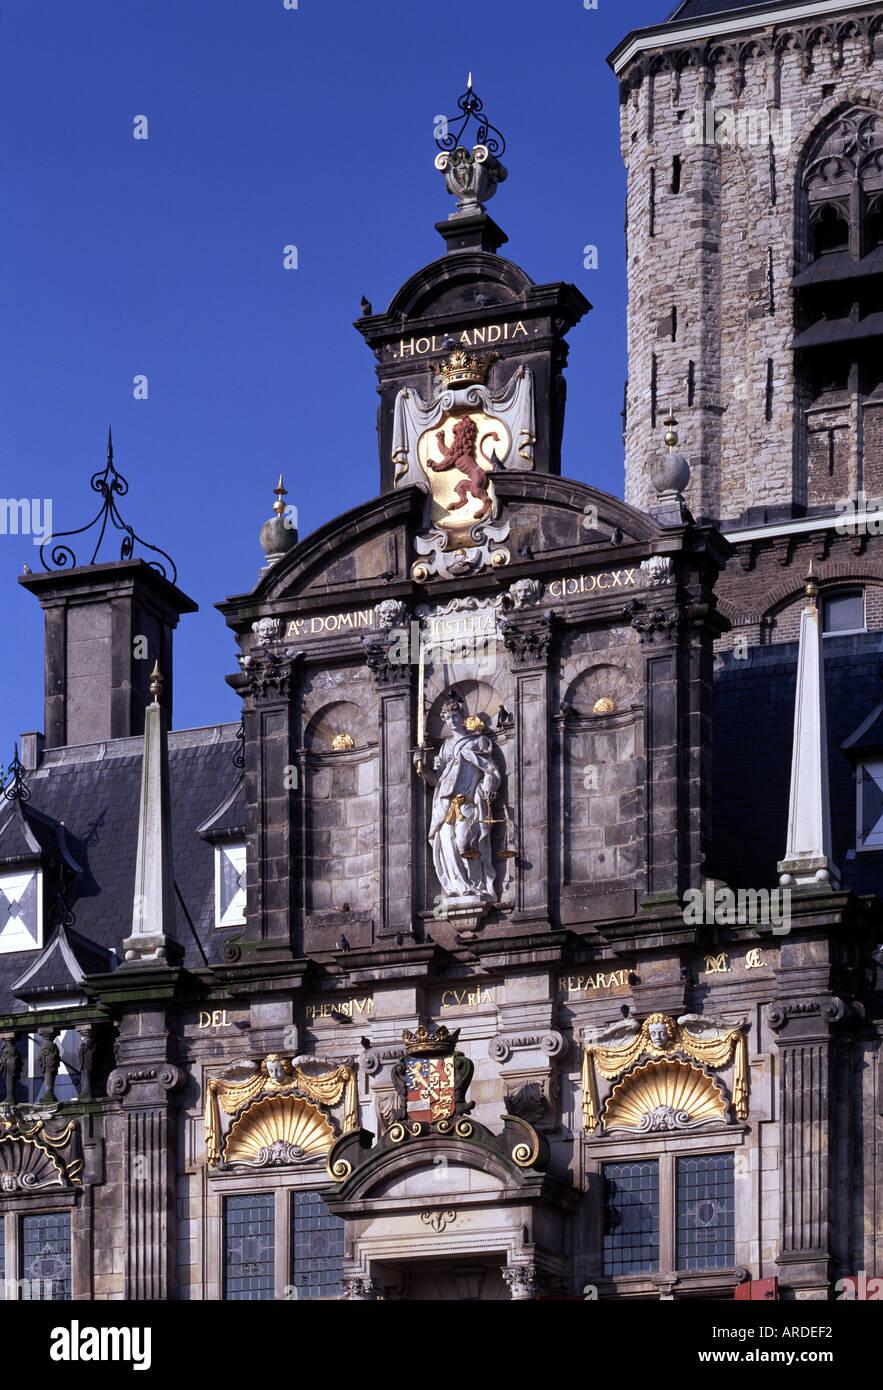 Delft, Stadhuis, Fassade - Stock Image